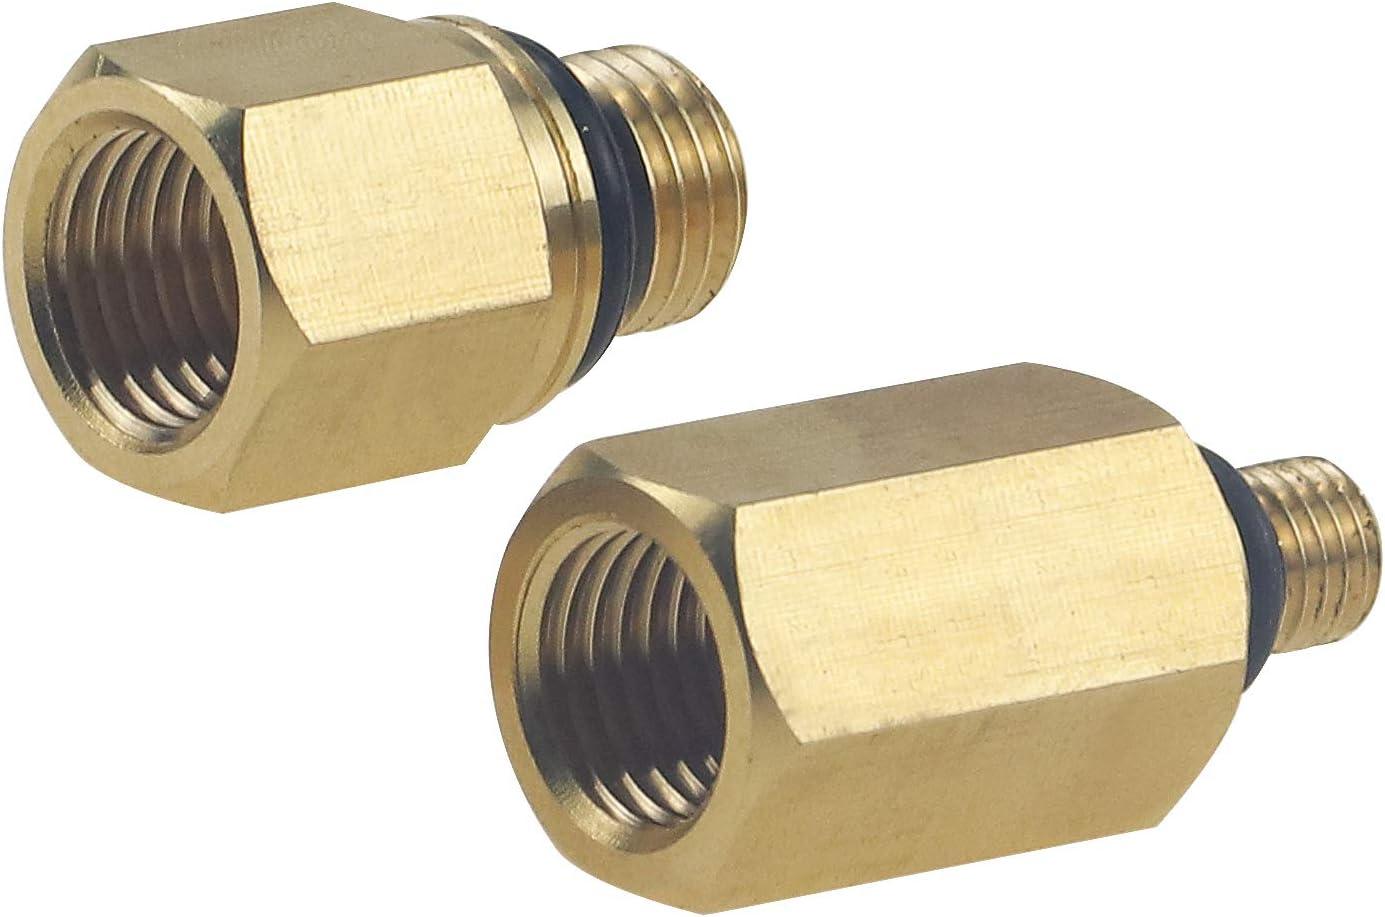 Sporthfish High Pressure Oil Rail Adapters Fuel Rail Adapter Leak Test Kit for Ford 6.0L Engine